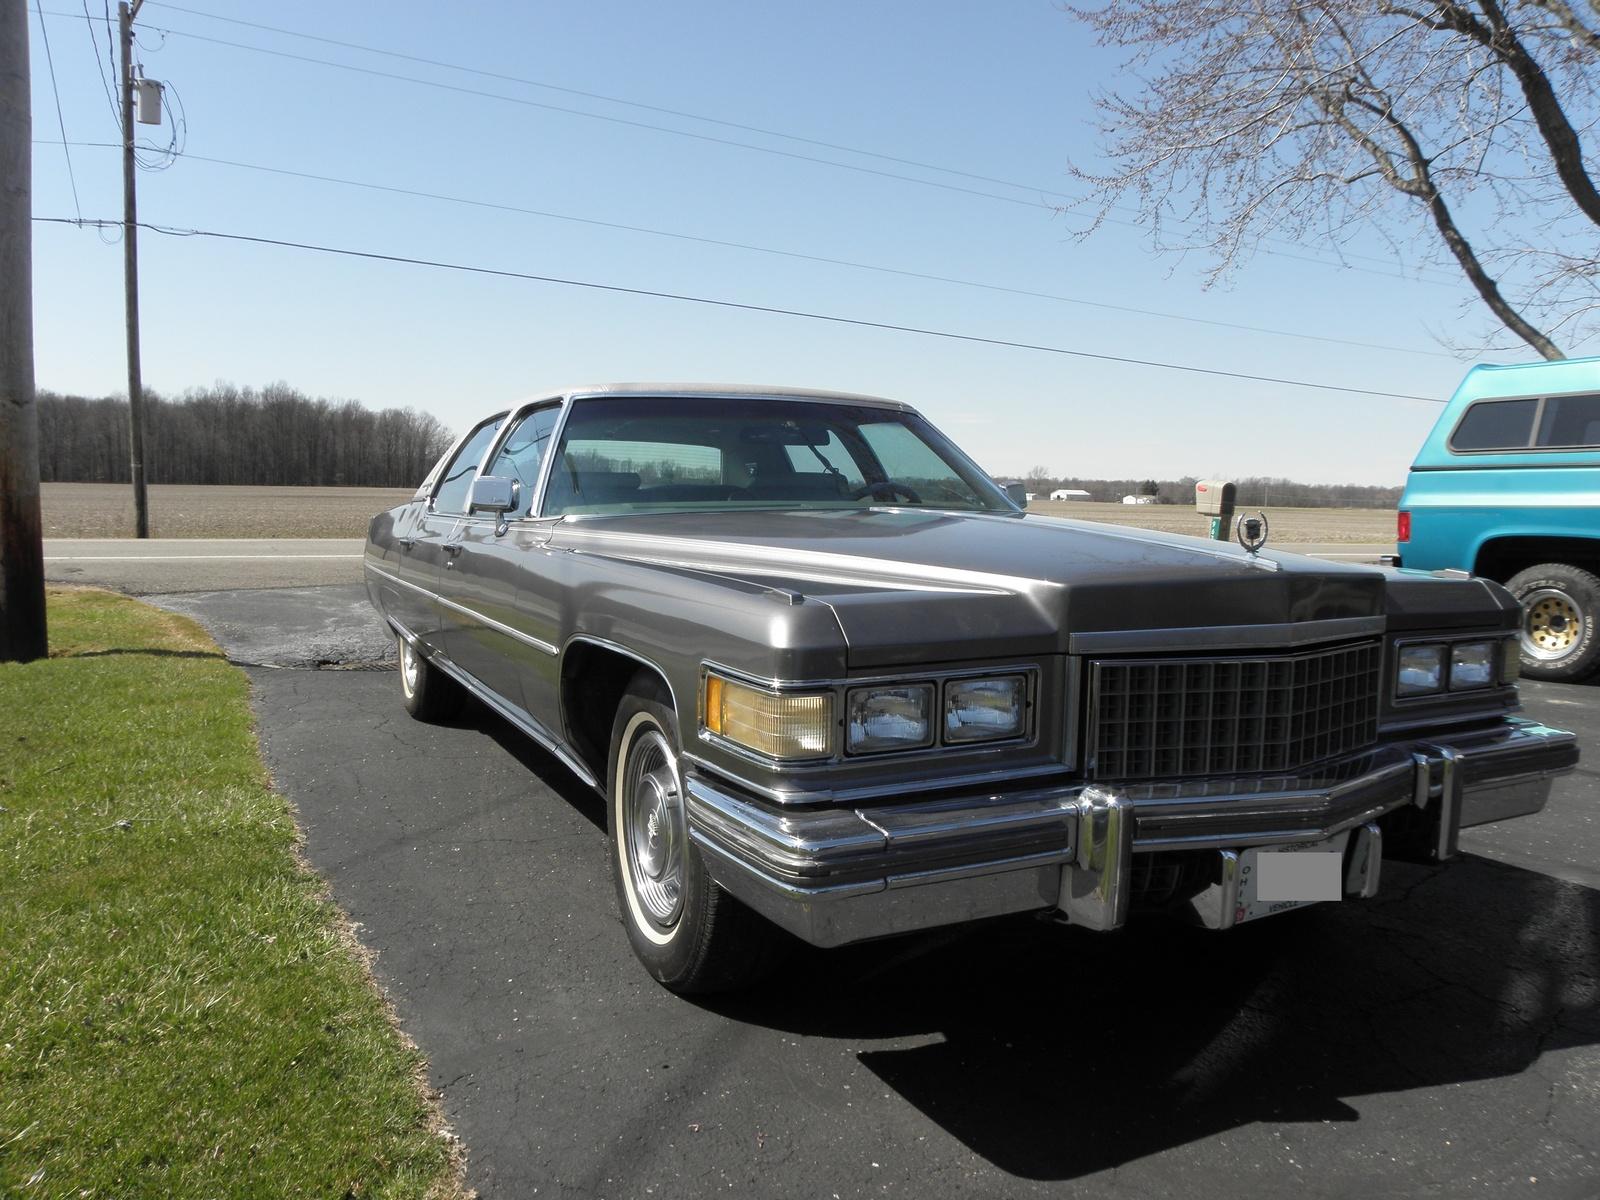 1976 Cadillac Fleetwood Overview Cargurus